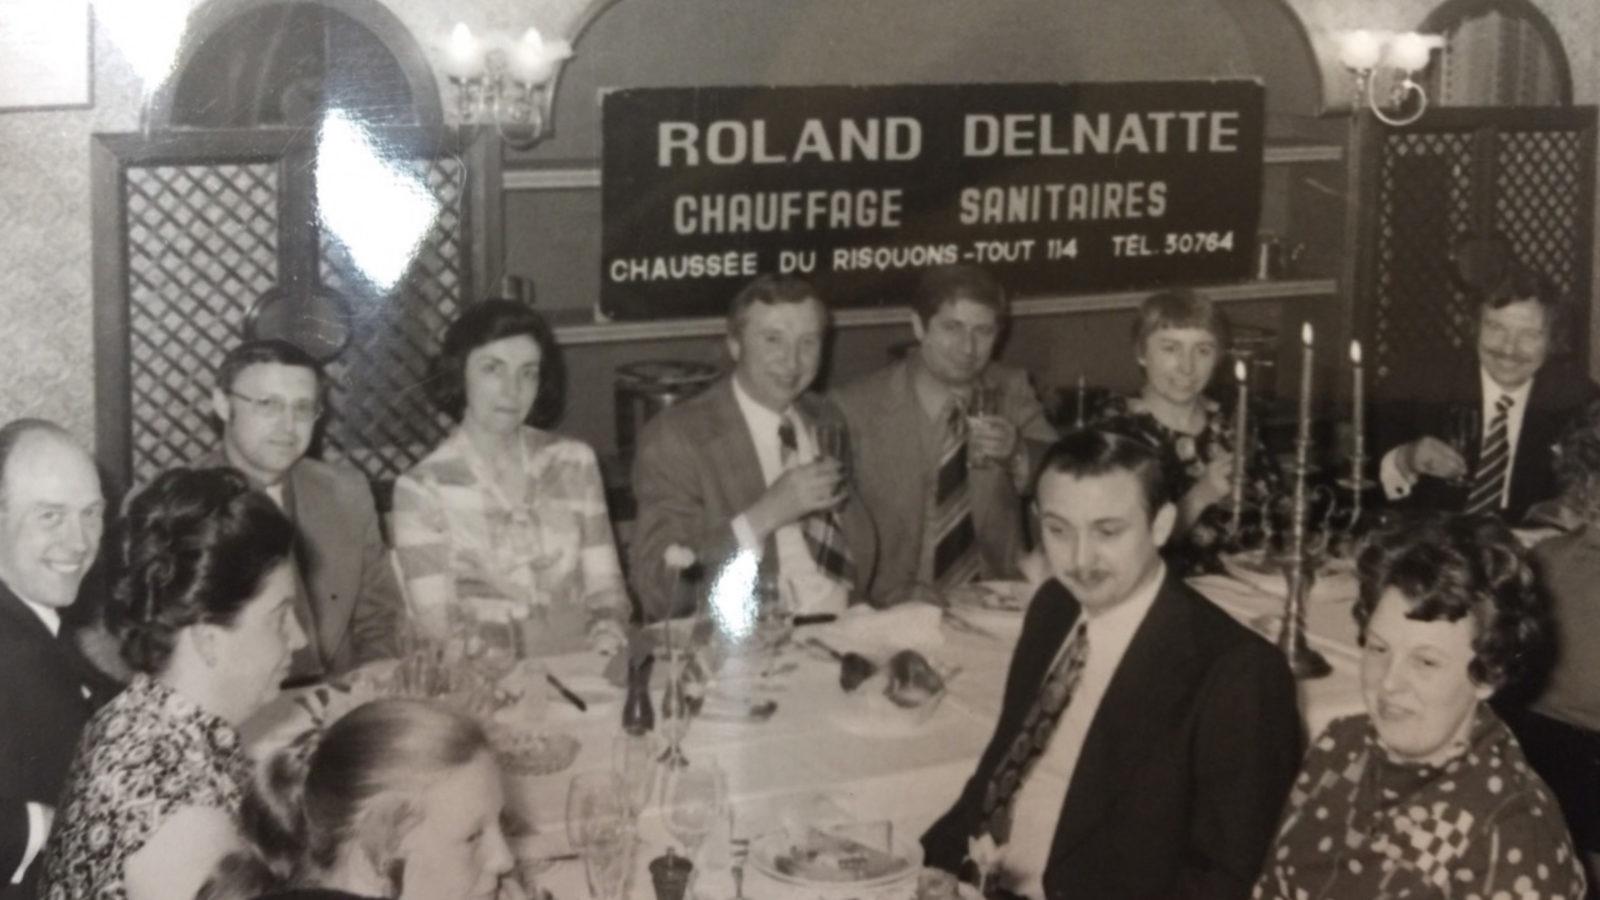 delnatte-story-01